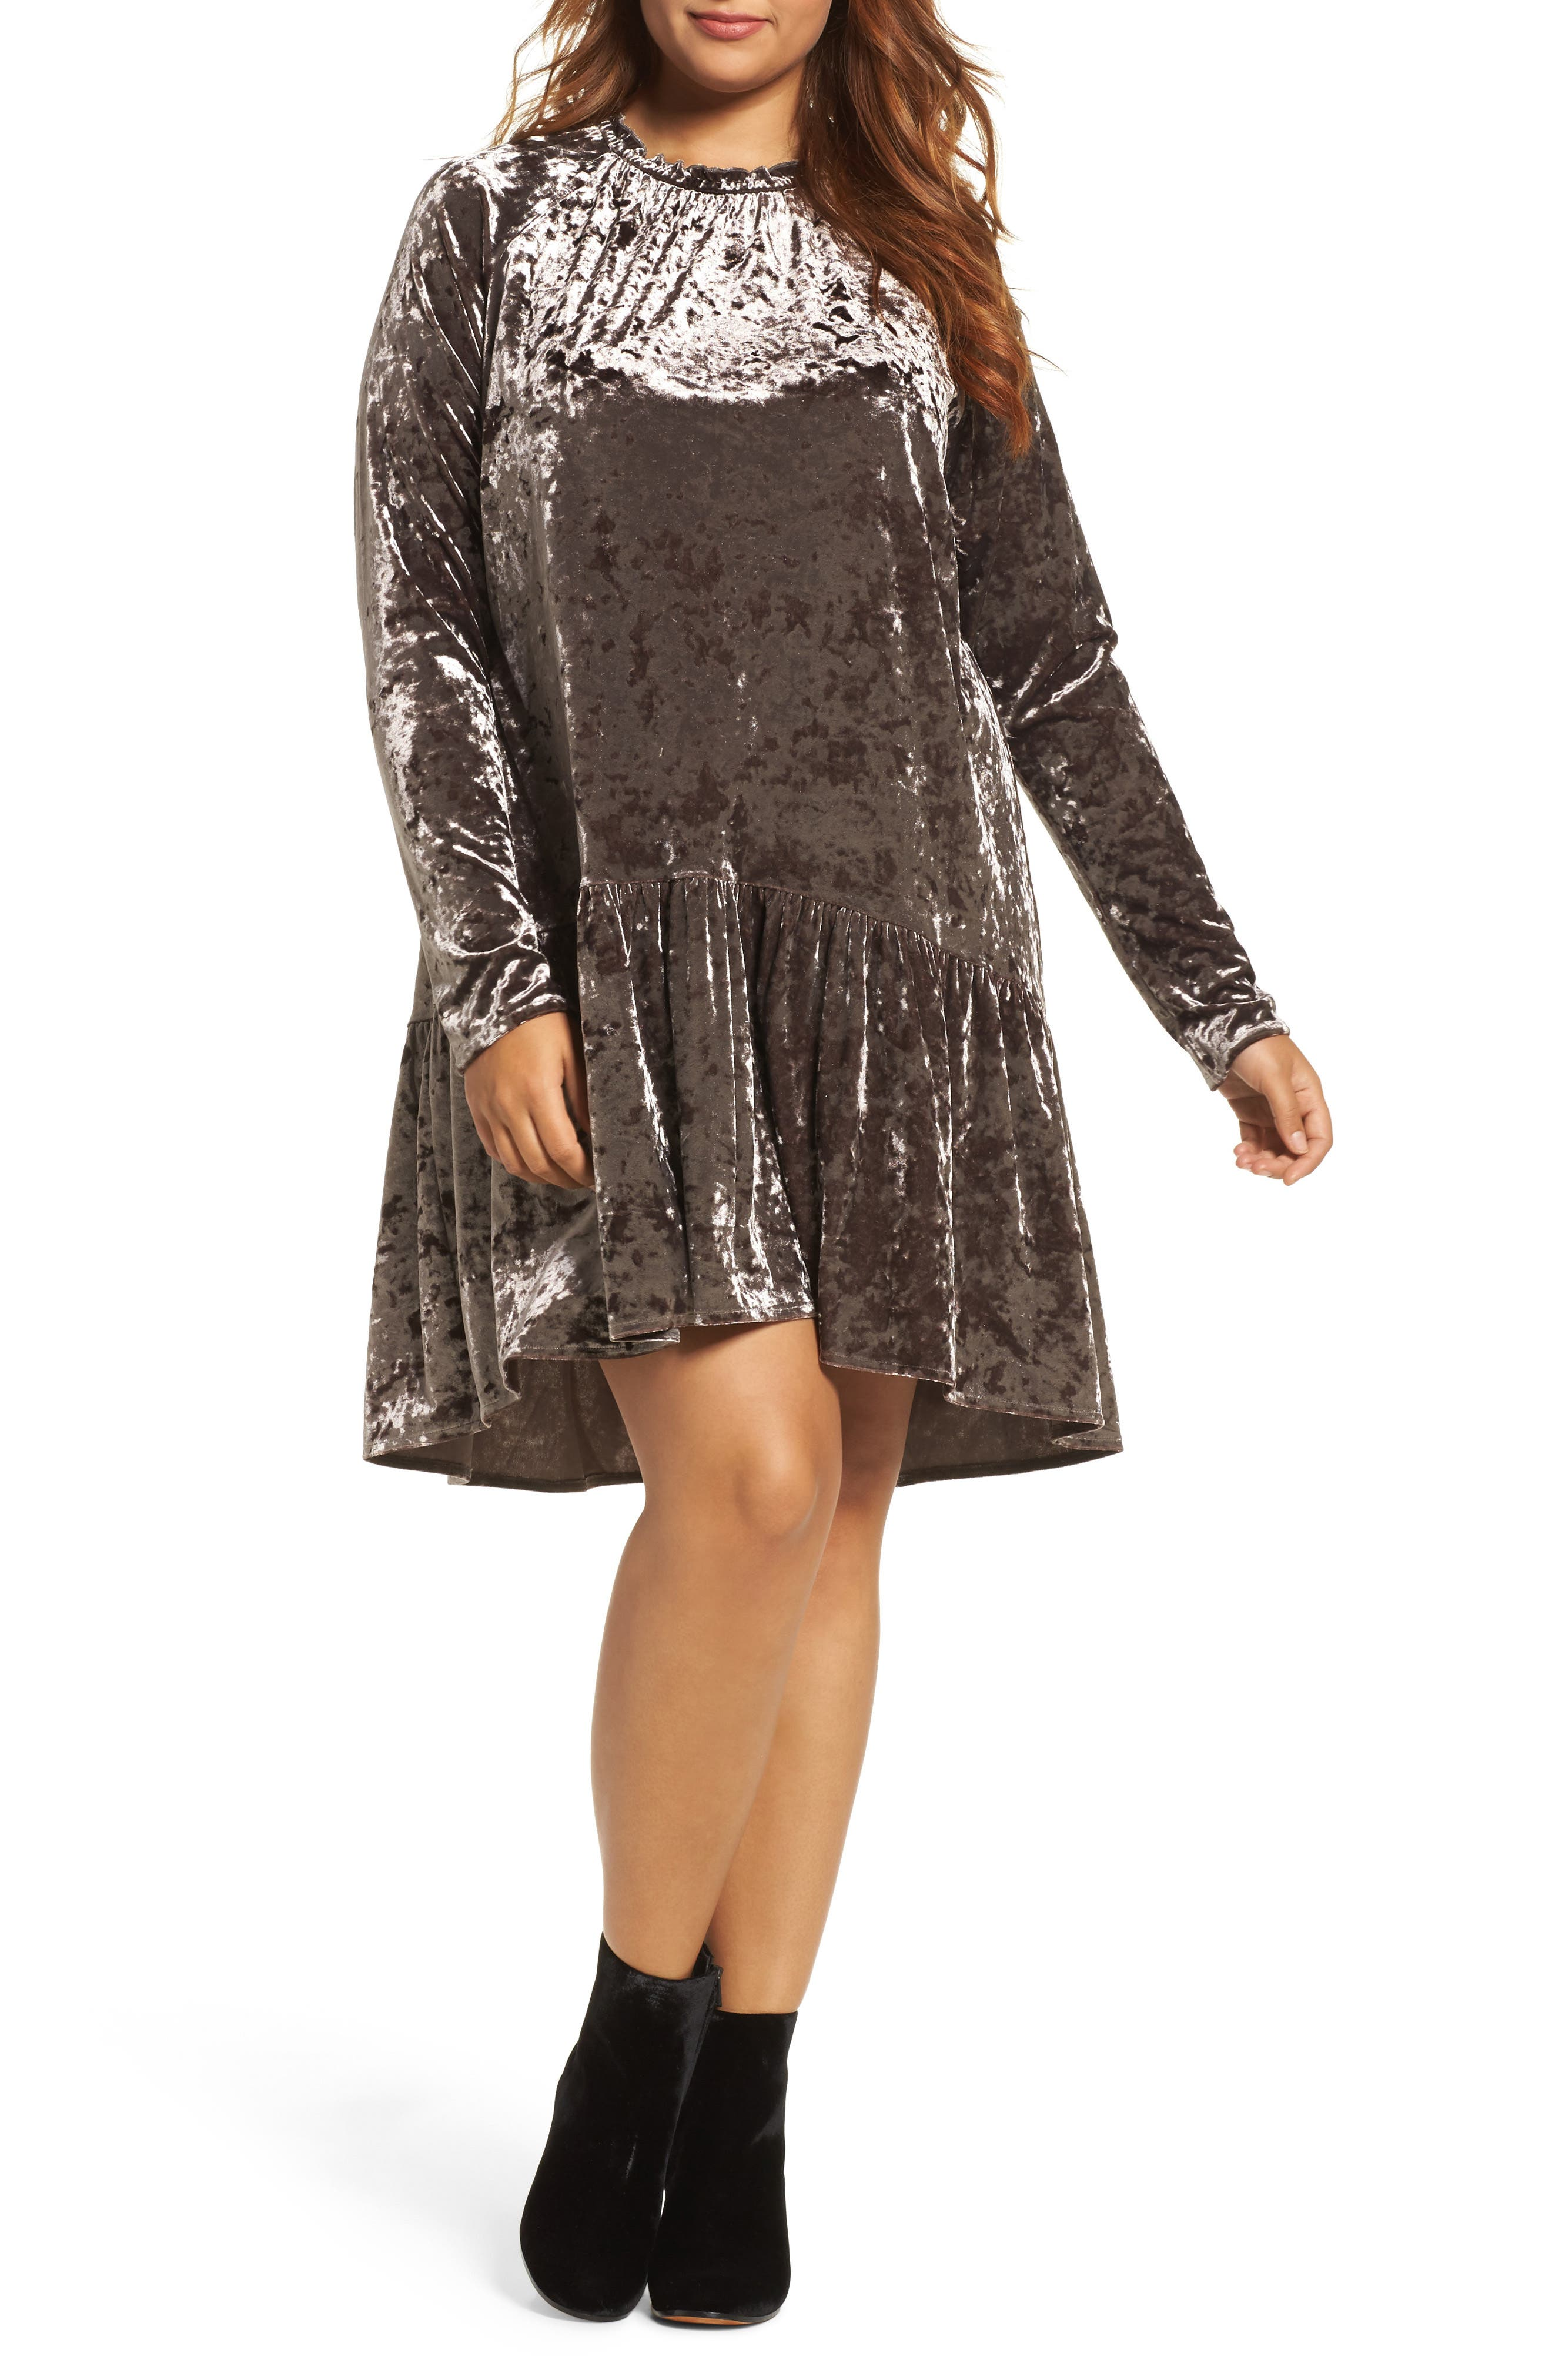 Alternate Image 1 Selected - ELVI Drop Waist Crushed Velvet Dress (Plus Size)